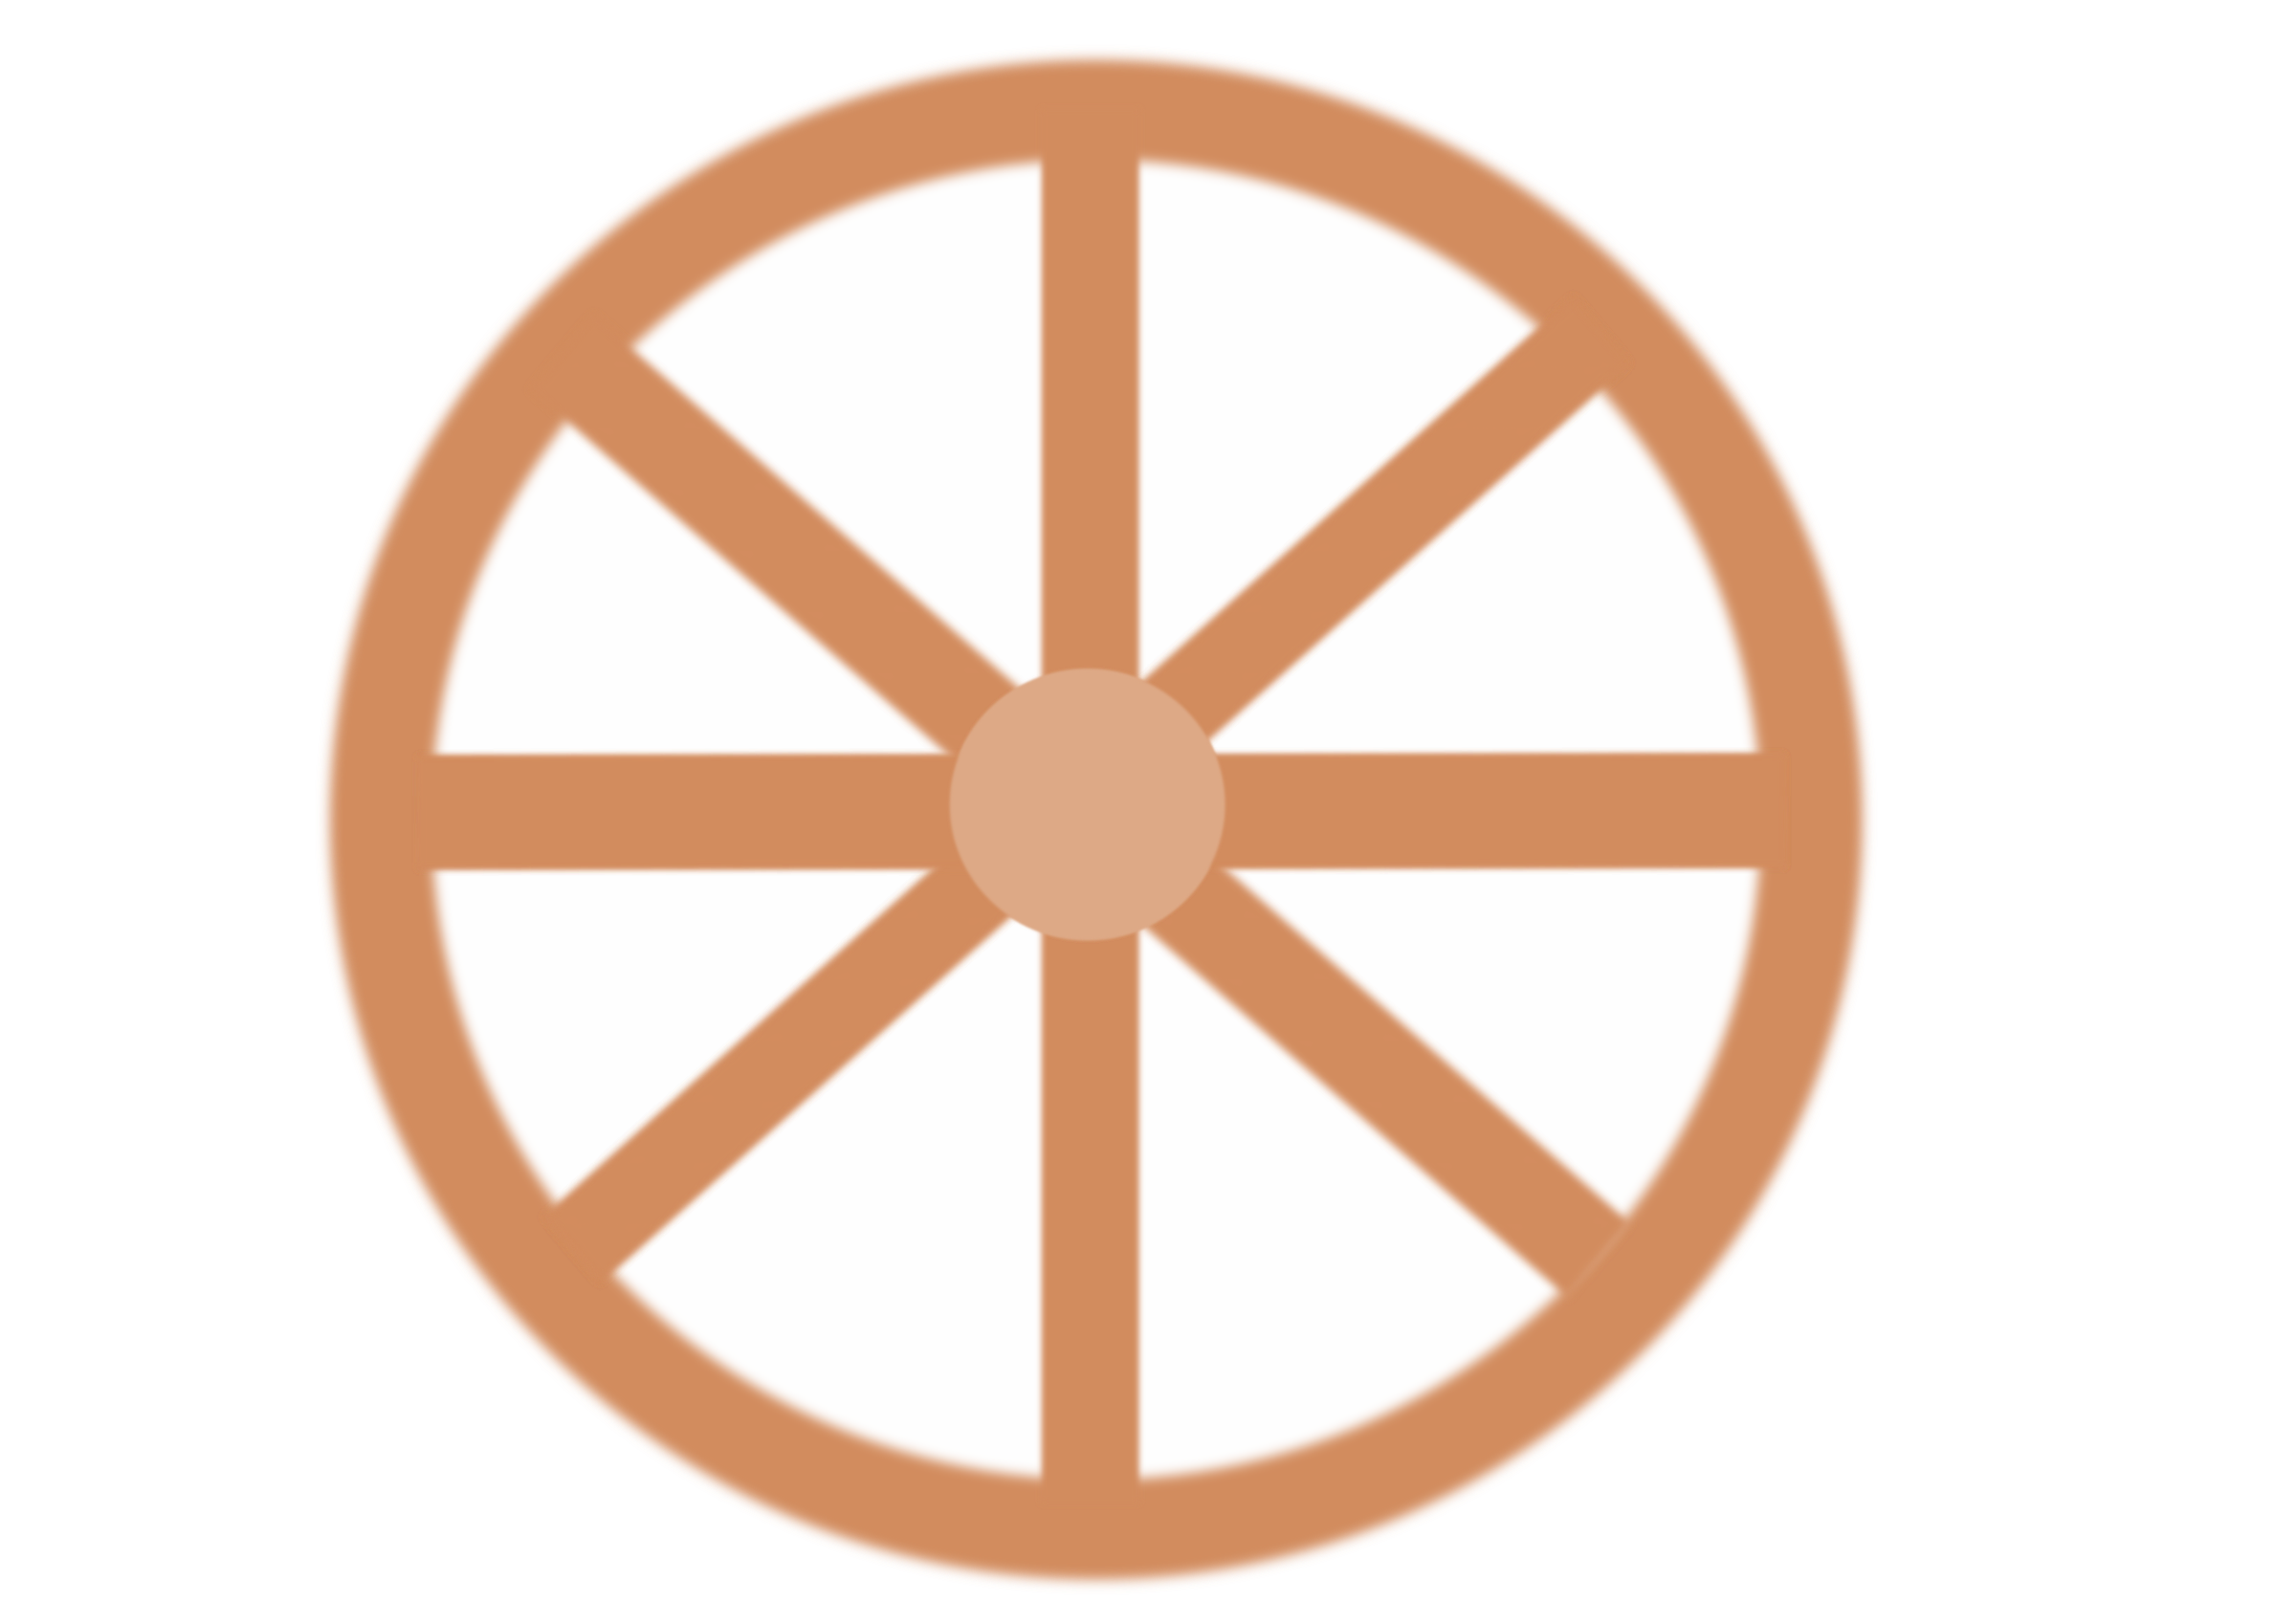 Cart big image png. Wheel clipart logo